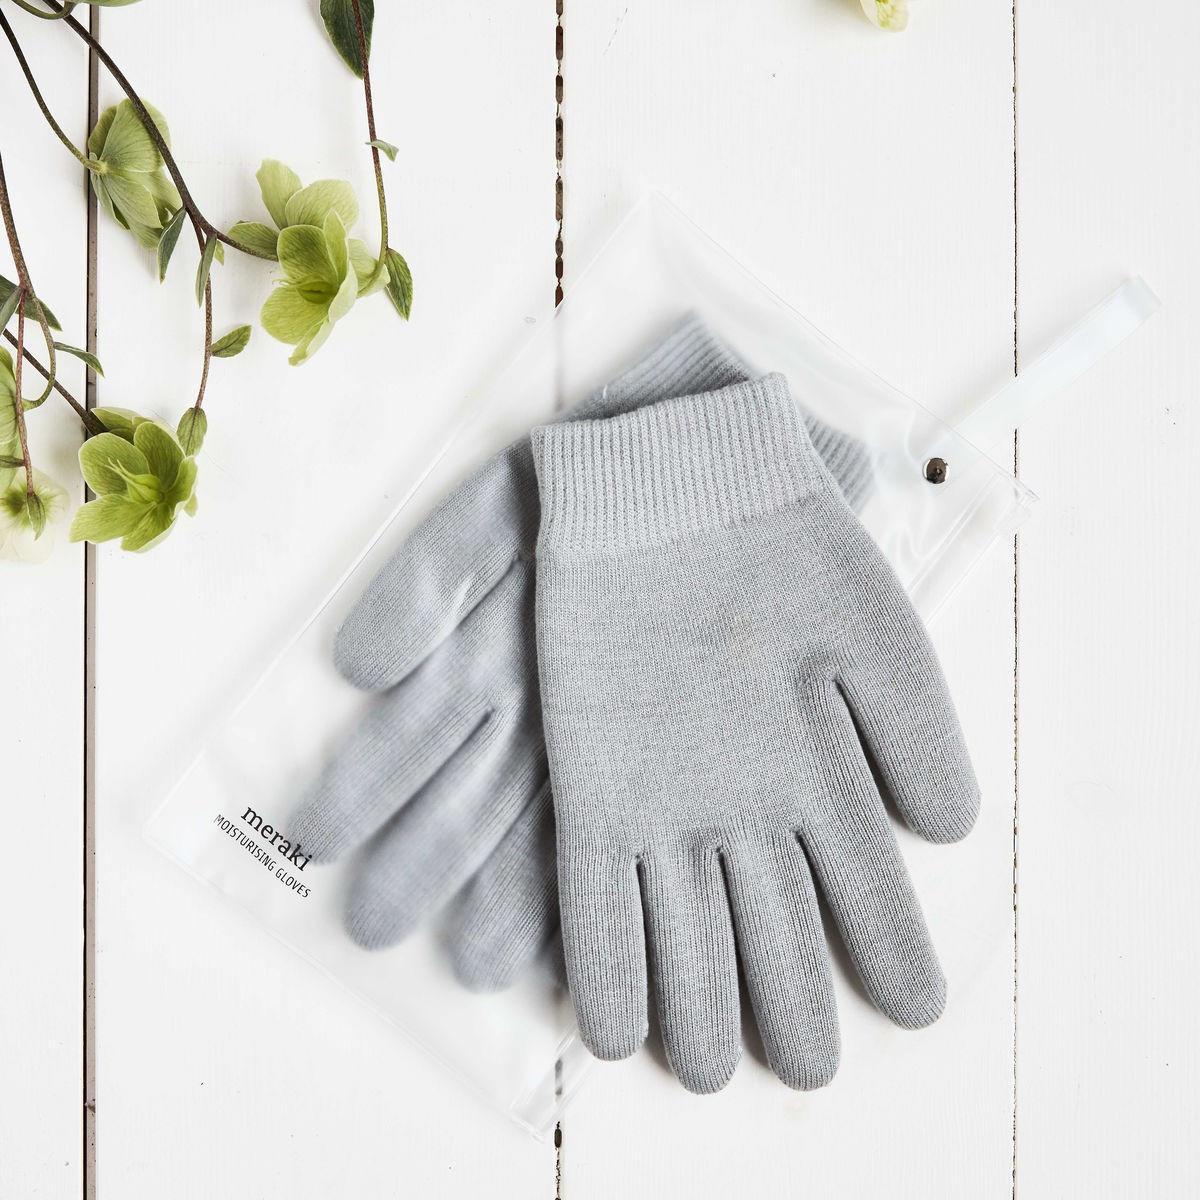 meraki Hydratační rukavice Meraki - 2 ks, šedá barva, plast, textil